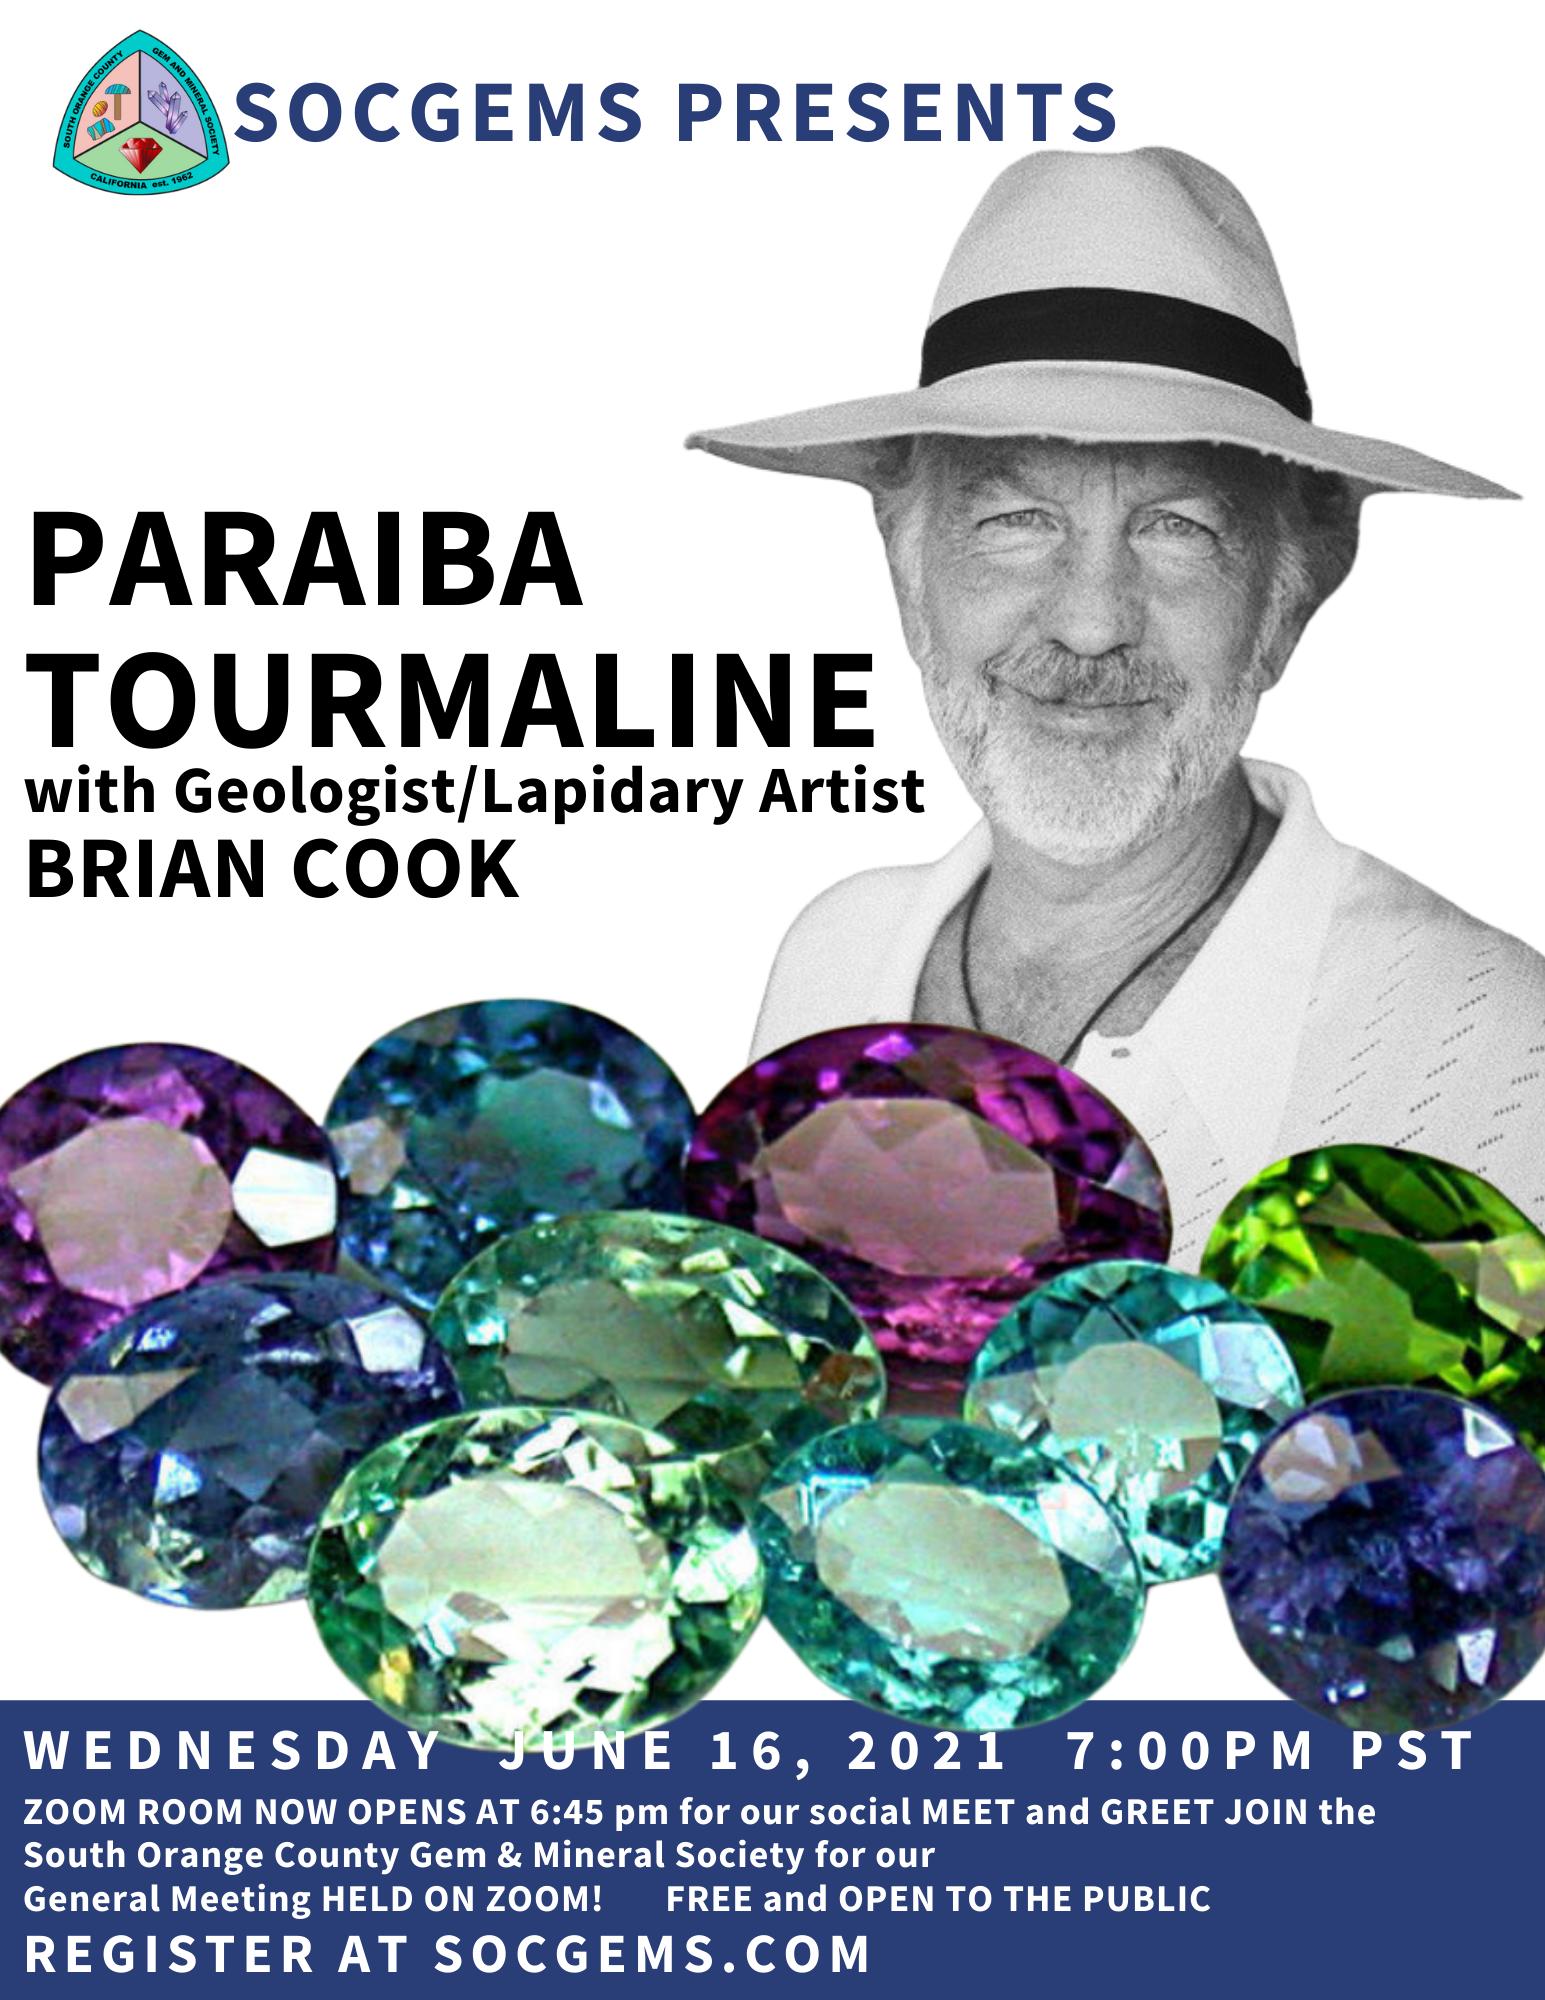 Brian Cook Paraiba Tourmaline